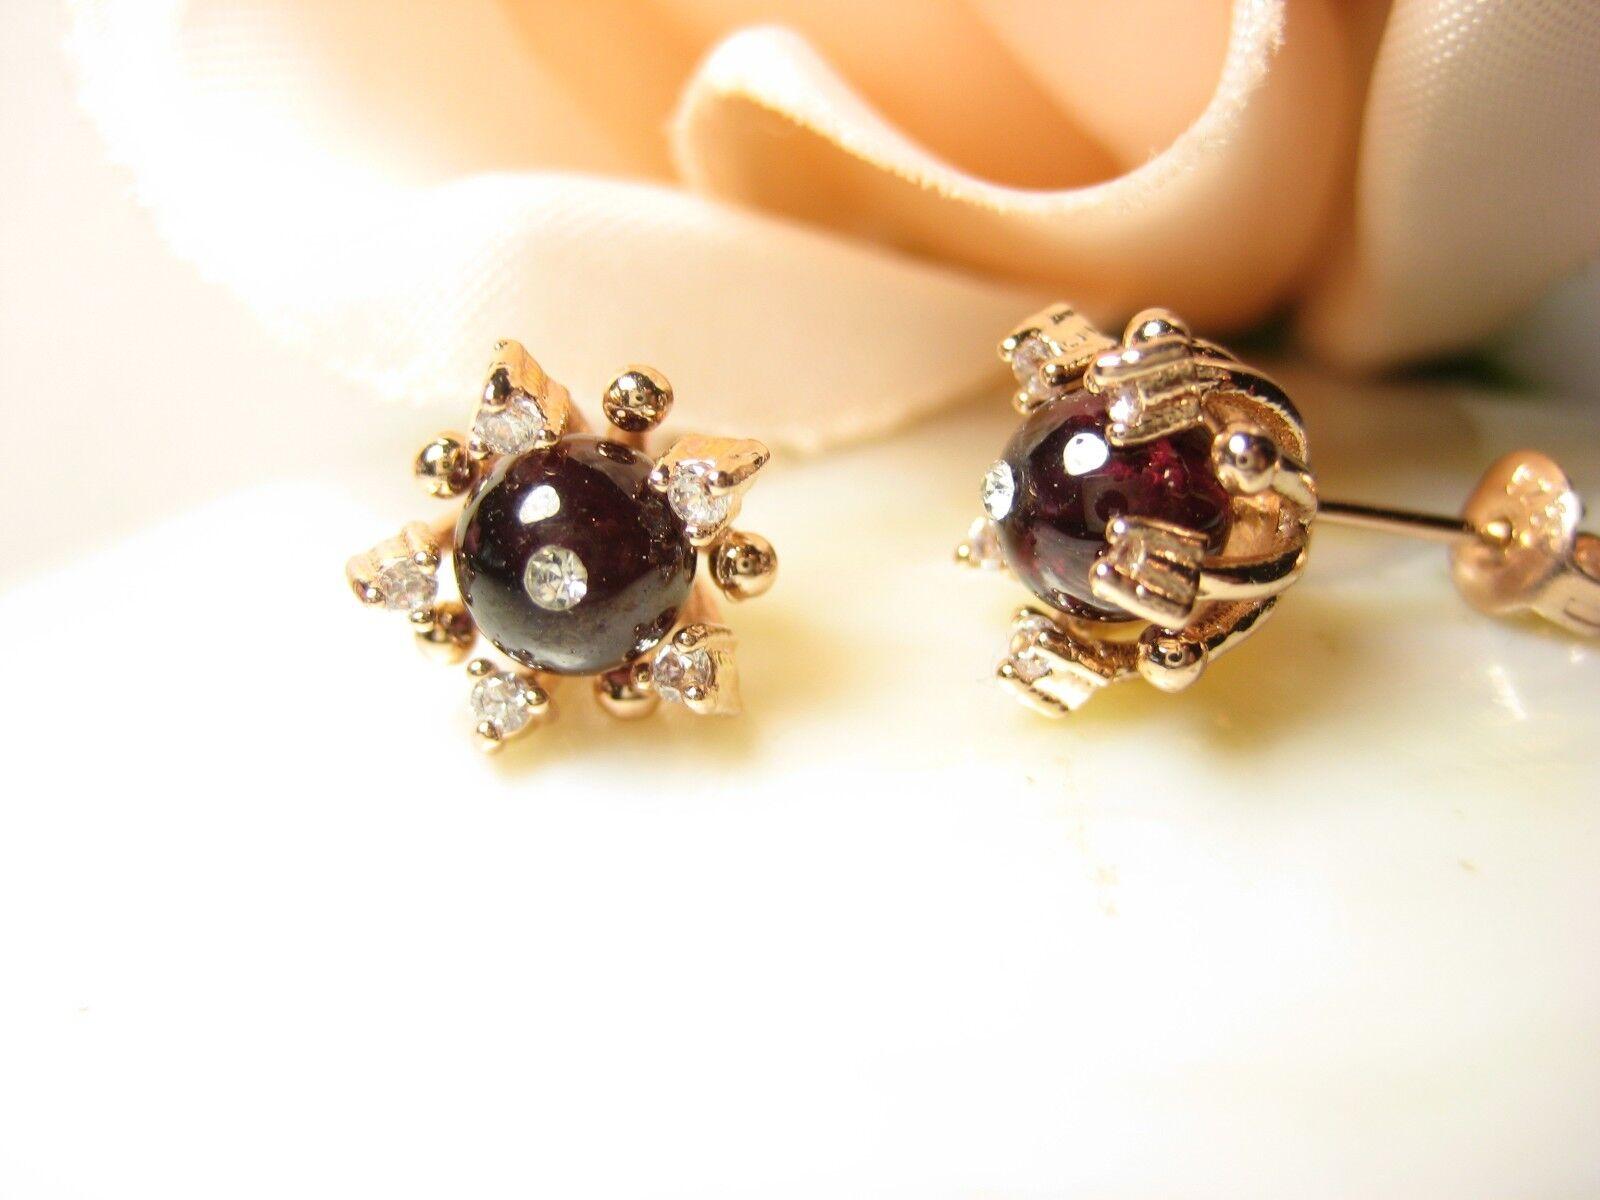 Arete 100/% natural lapis lazuli dorado 925 plata pendientes perlas joyas